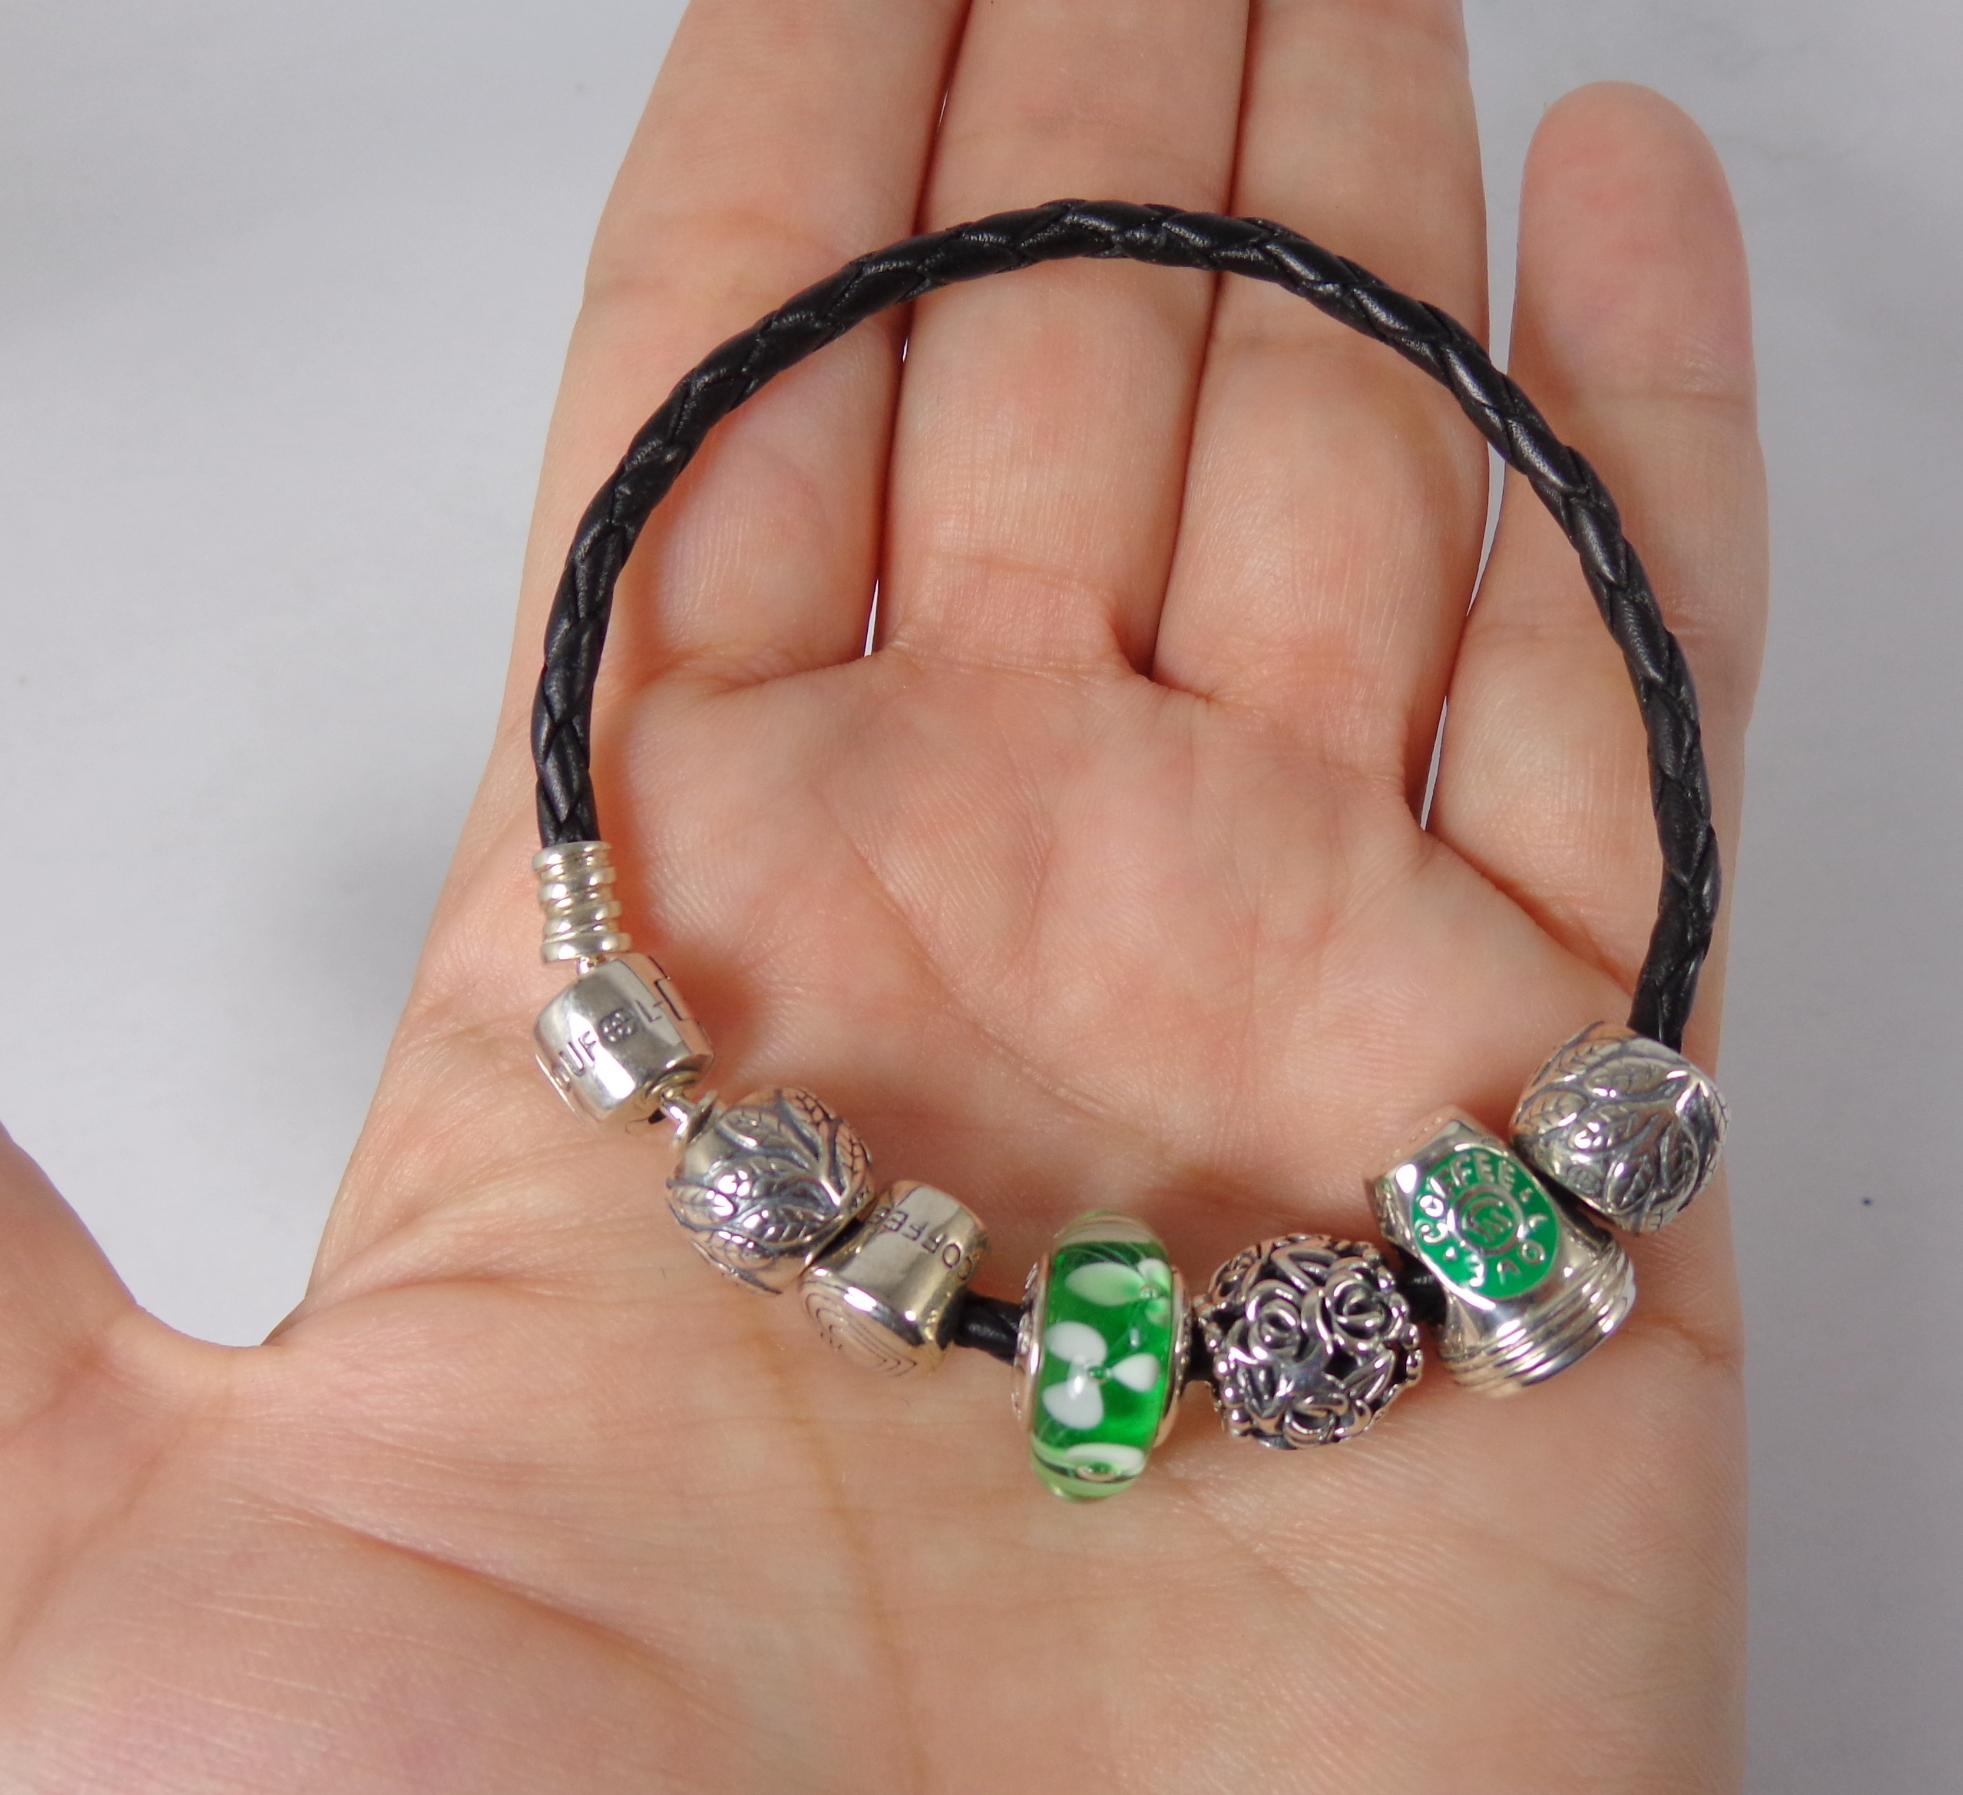 Inexpensive Charm Bracelets: SOUFEEL Affordable Charm Bracelets